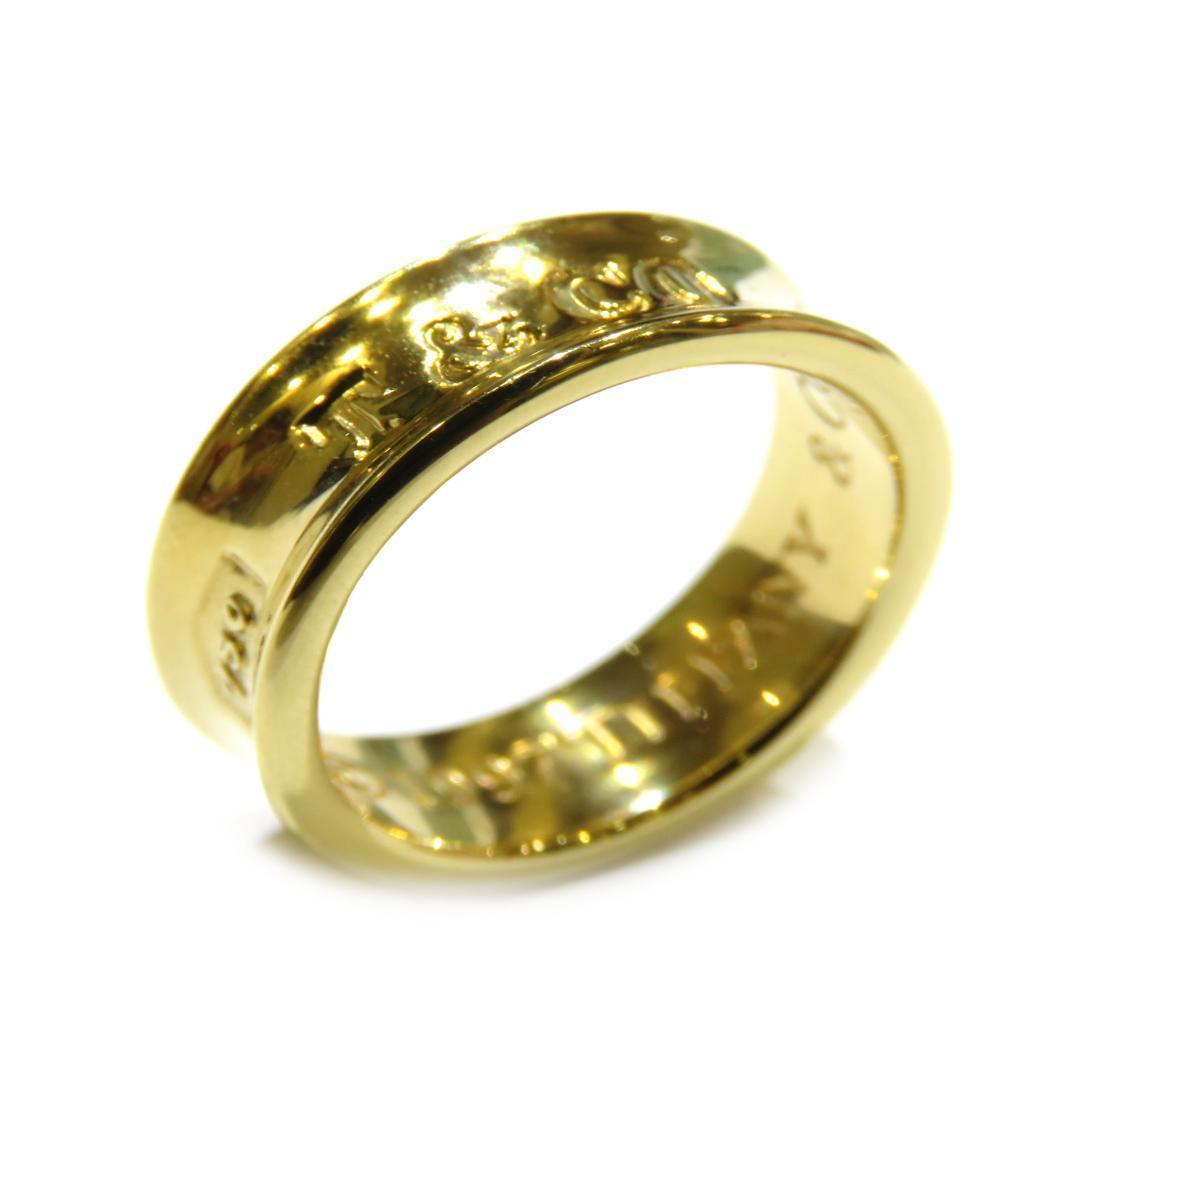 TIFFANY & CO 1837 Narrow Ring Ladies K18YG (750) No. 6.5